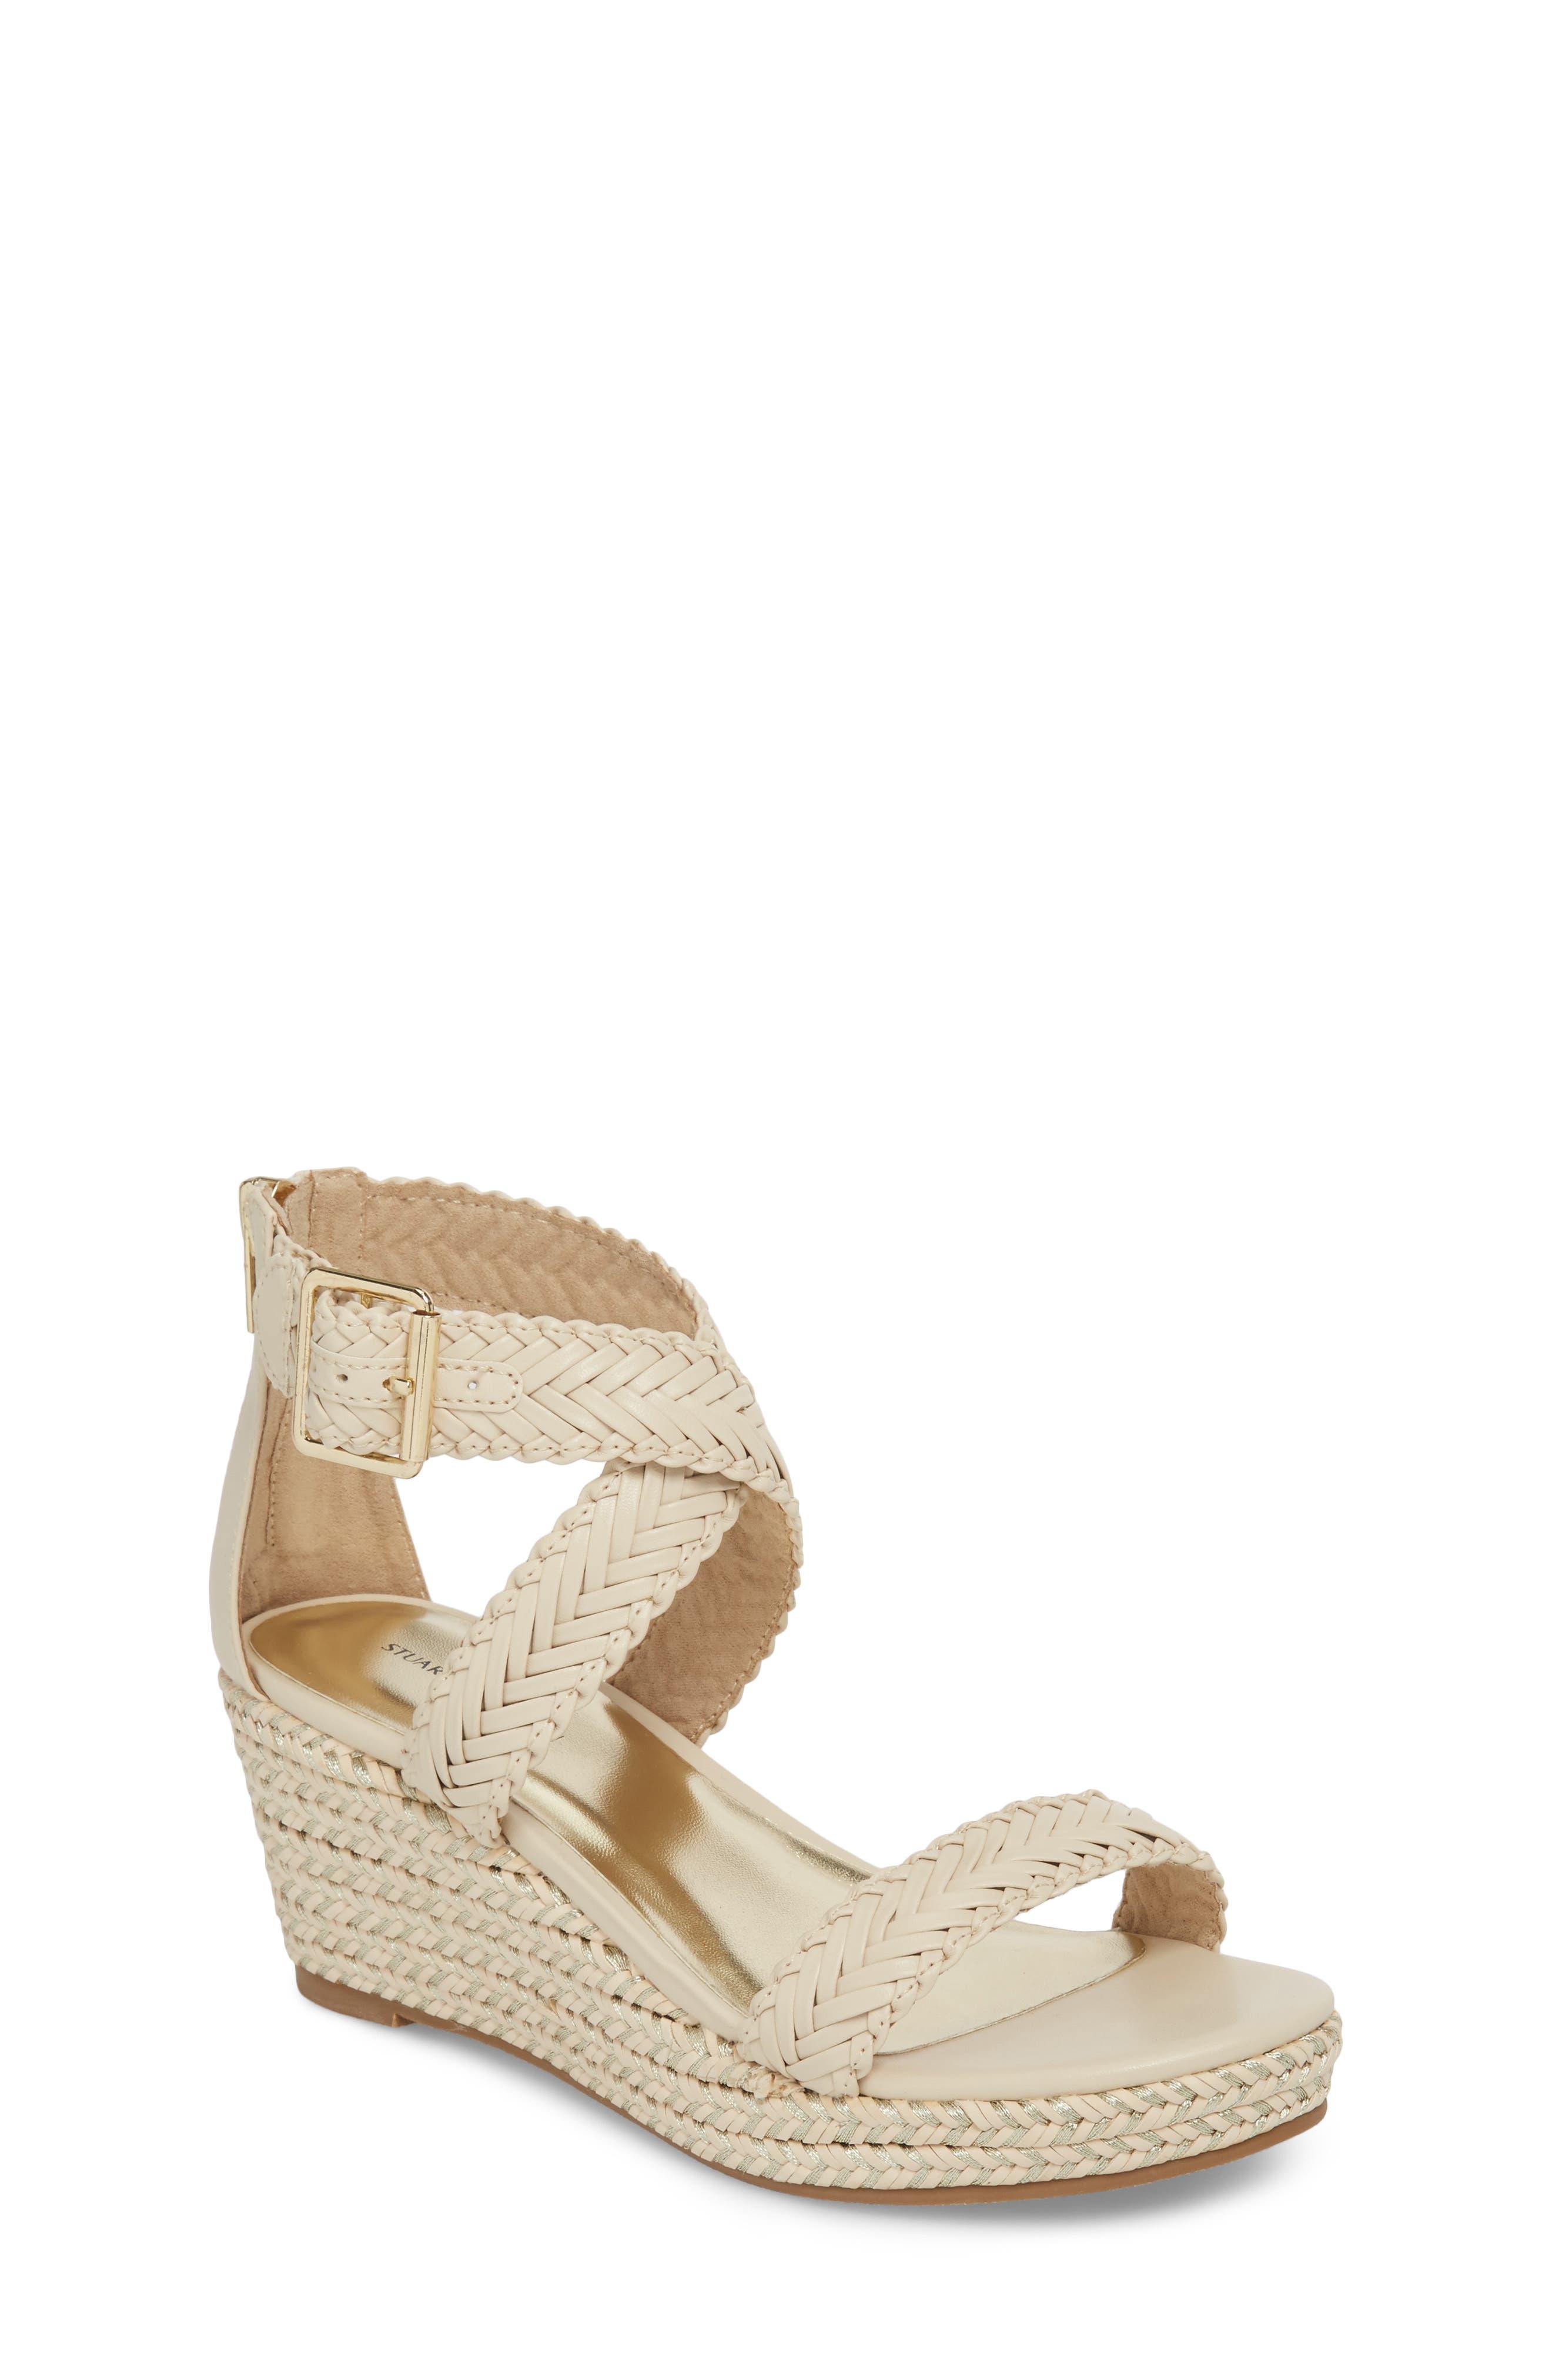 Akilah Sparkle Wedge Sandal, Main, color, OFF WHITE